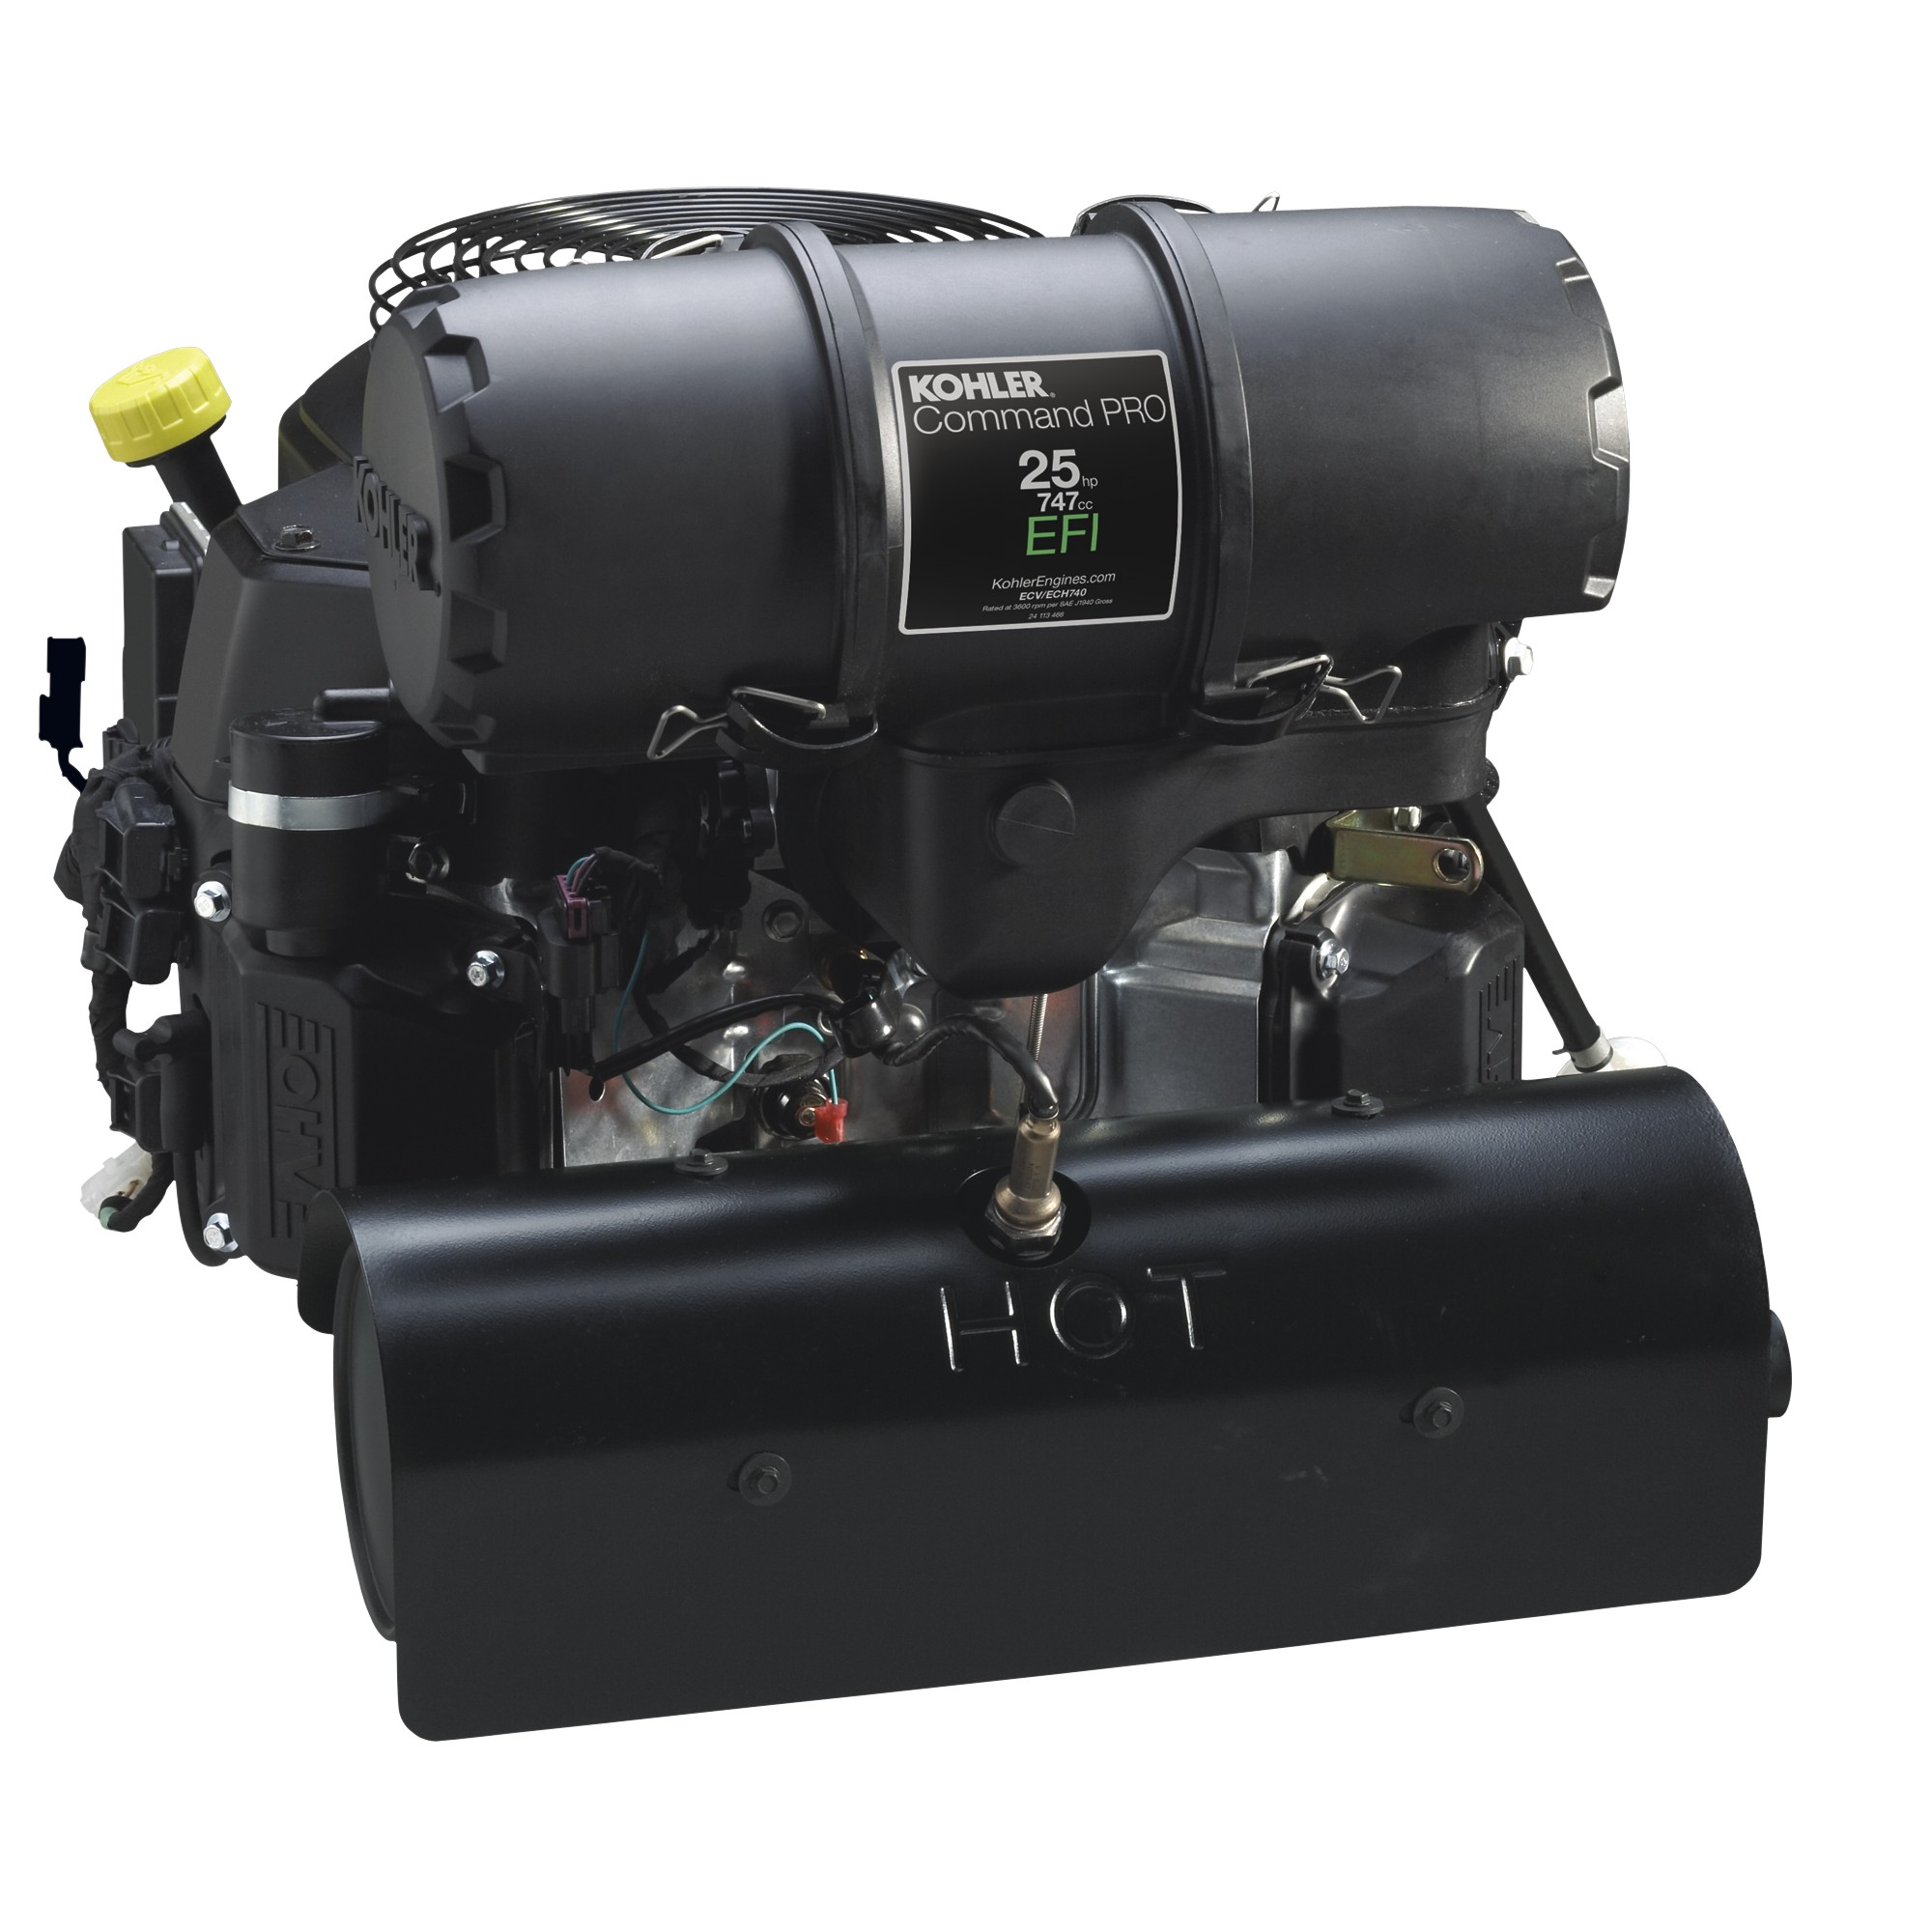 aab58975_cmyk?fmt=jpg&op_usm=1130&size=250250&extend=003030&effect= 1&$shadow$&color=100100100&blendMode=mult&opac=33&op_grow=2&op_blur=16&pos=1616 kohler engines ecv740 command pro efi product detail engines Kohler Small Engine Wiring Diagram at gsmportal.co